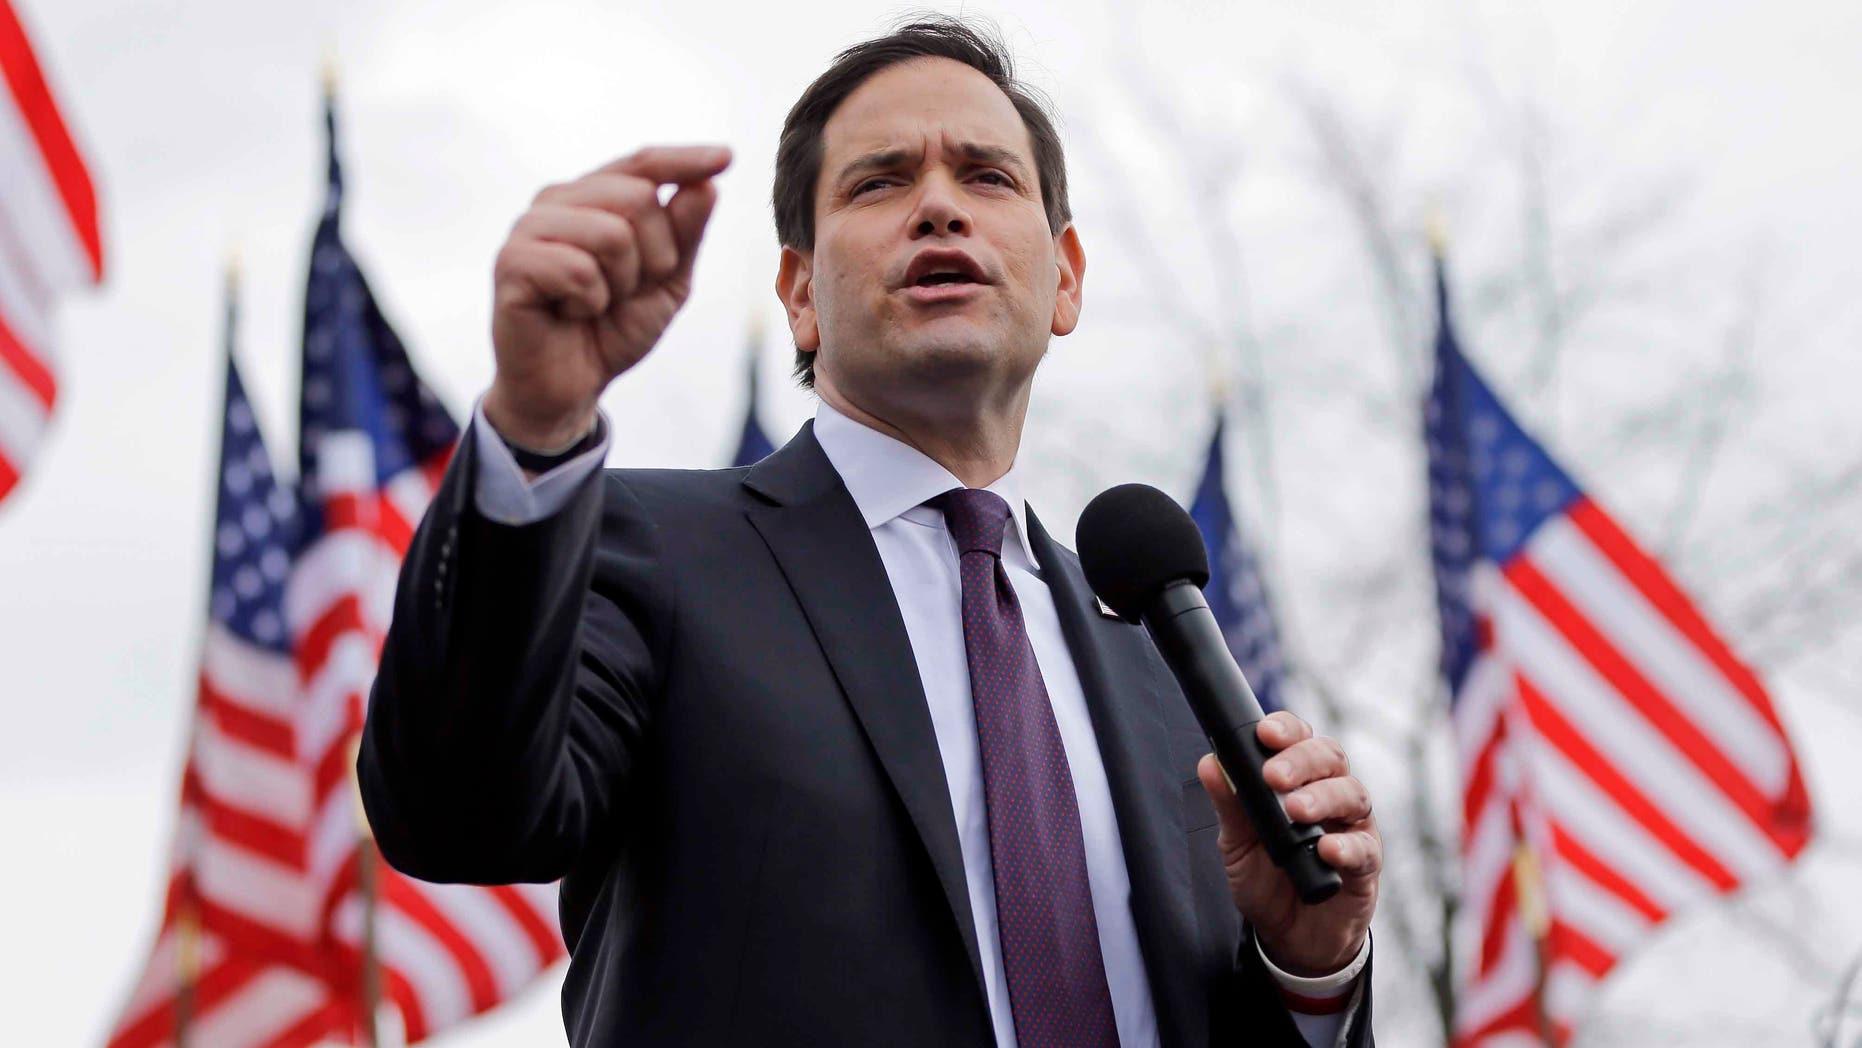 Republican candidate Sen. Marco Rubio at a rally Sunday, Feb. 21, 2016, in Franklin, Tenn.